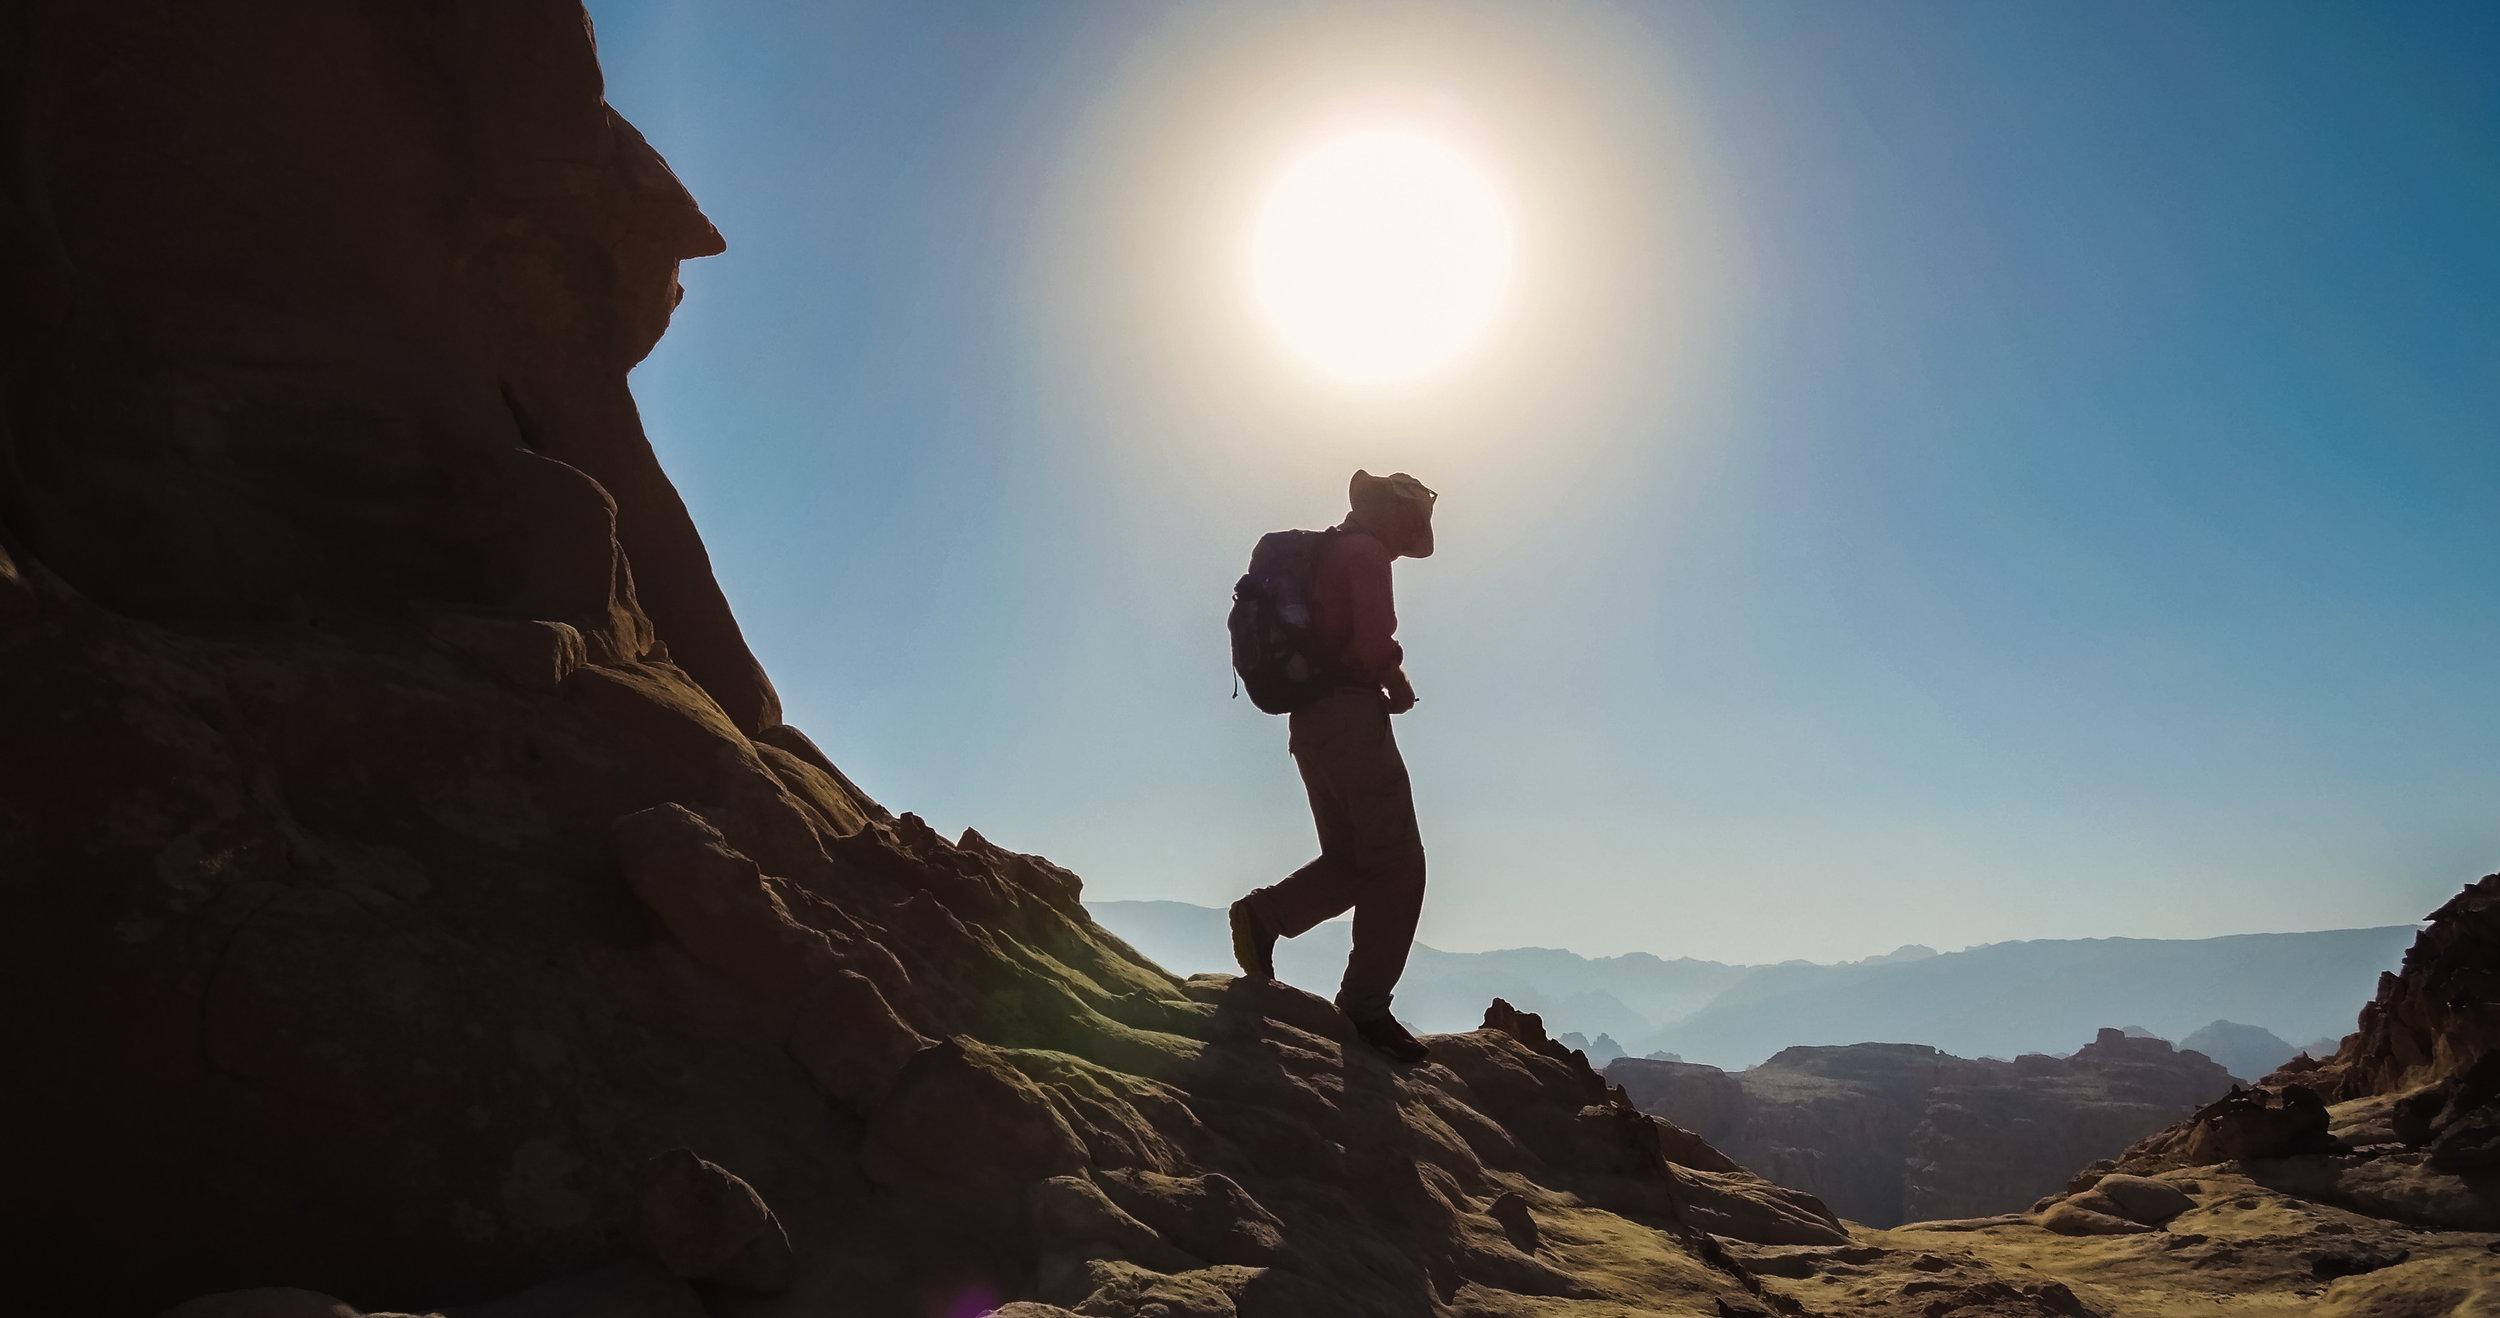 Ali-Barqawi-Studios-Explore-Series-Travel-Adventure-Jordan-Trail-Thru-Hike-Wadi-Gseib-to-Wadi-Rakiya-2016-012-2.jpg